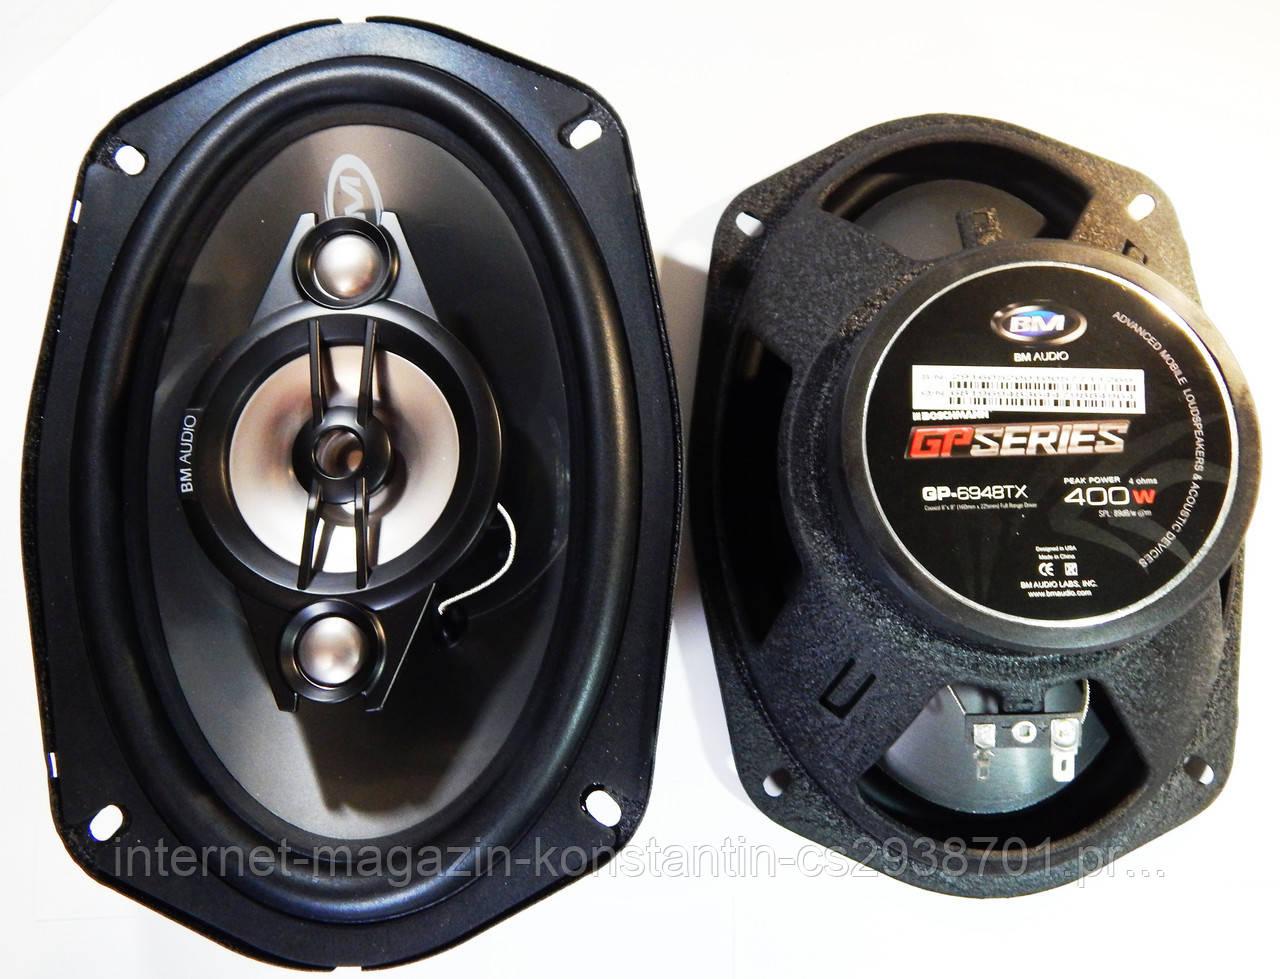 Автомобильная акустика Овалы BOSCHMANN GP-6948TX 400 Вт! Мощный Звук!